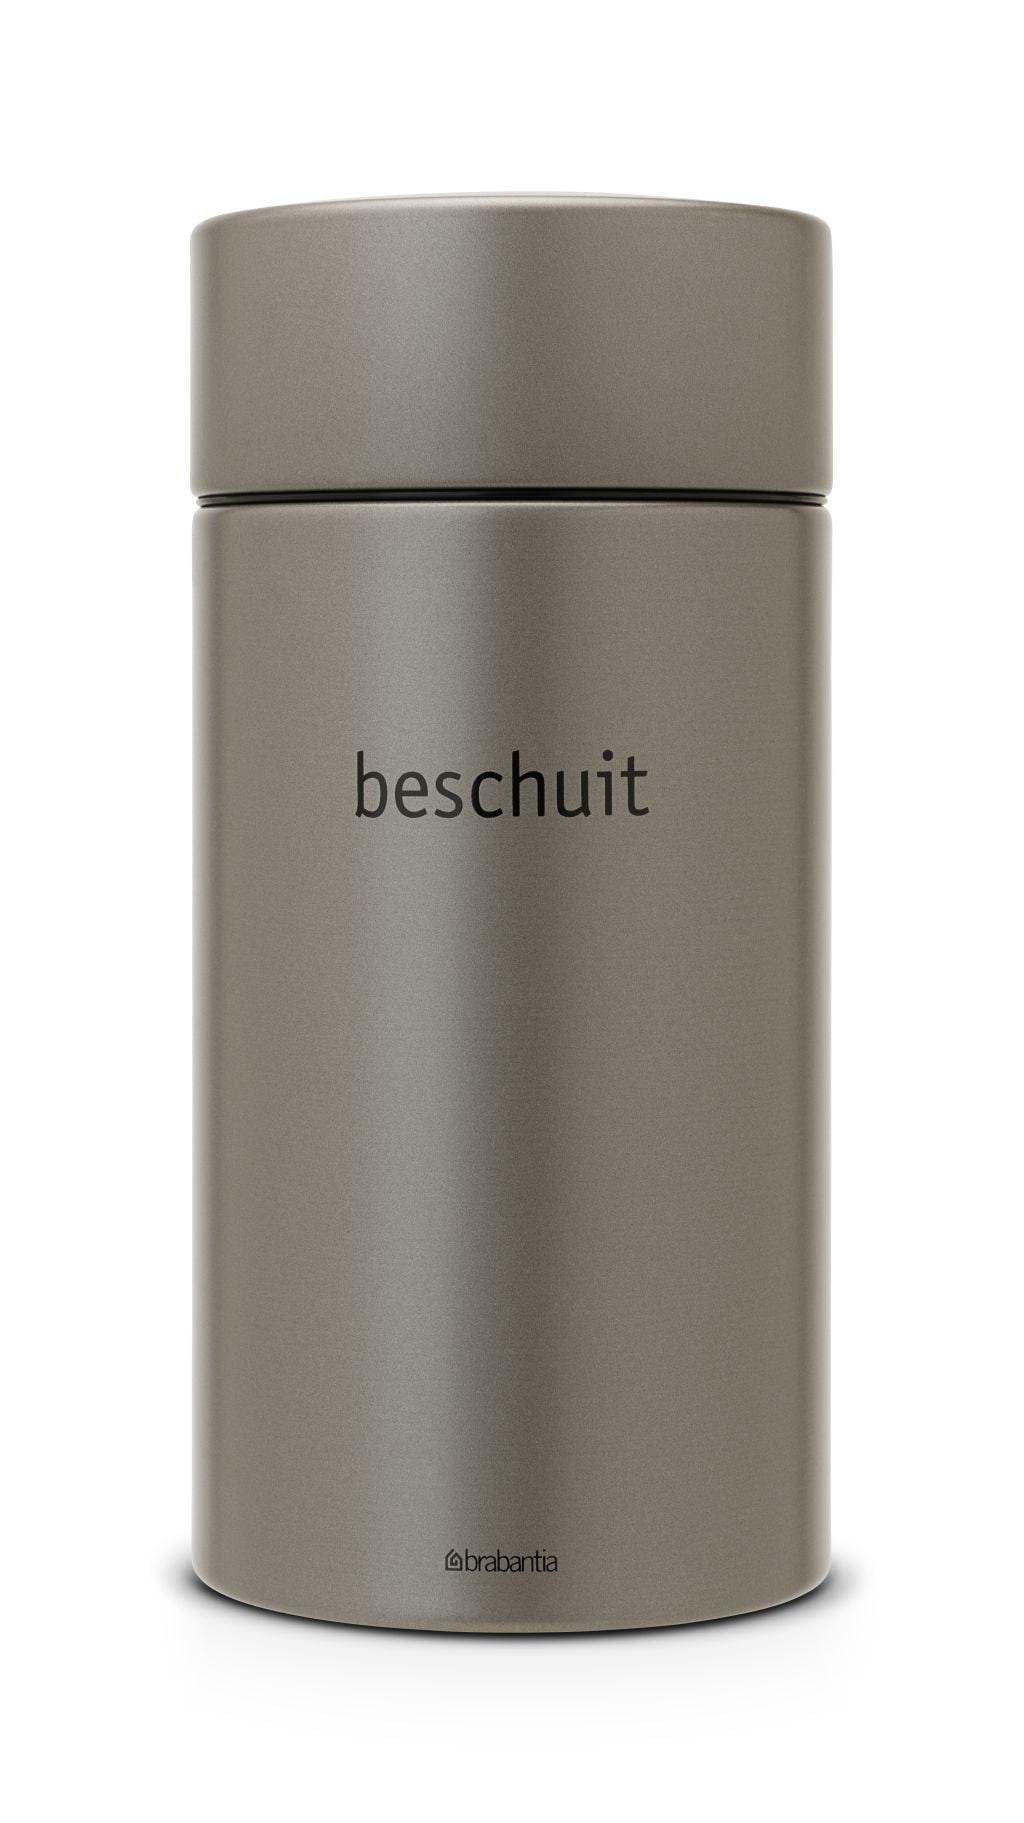 Brabantia beschuitbus 1,7 liter platinum